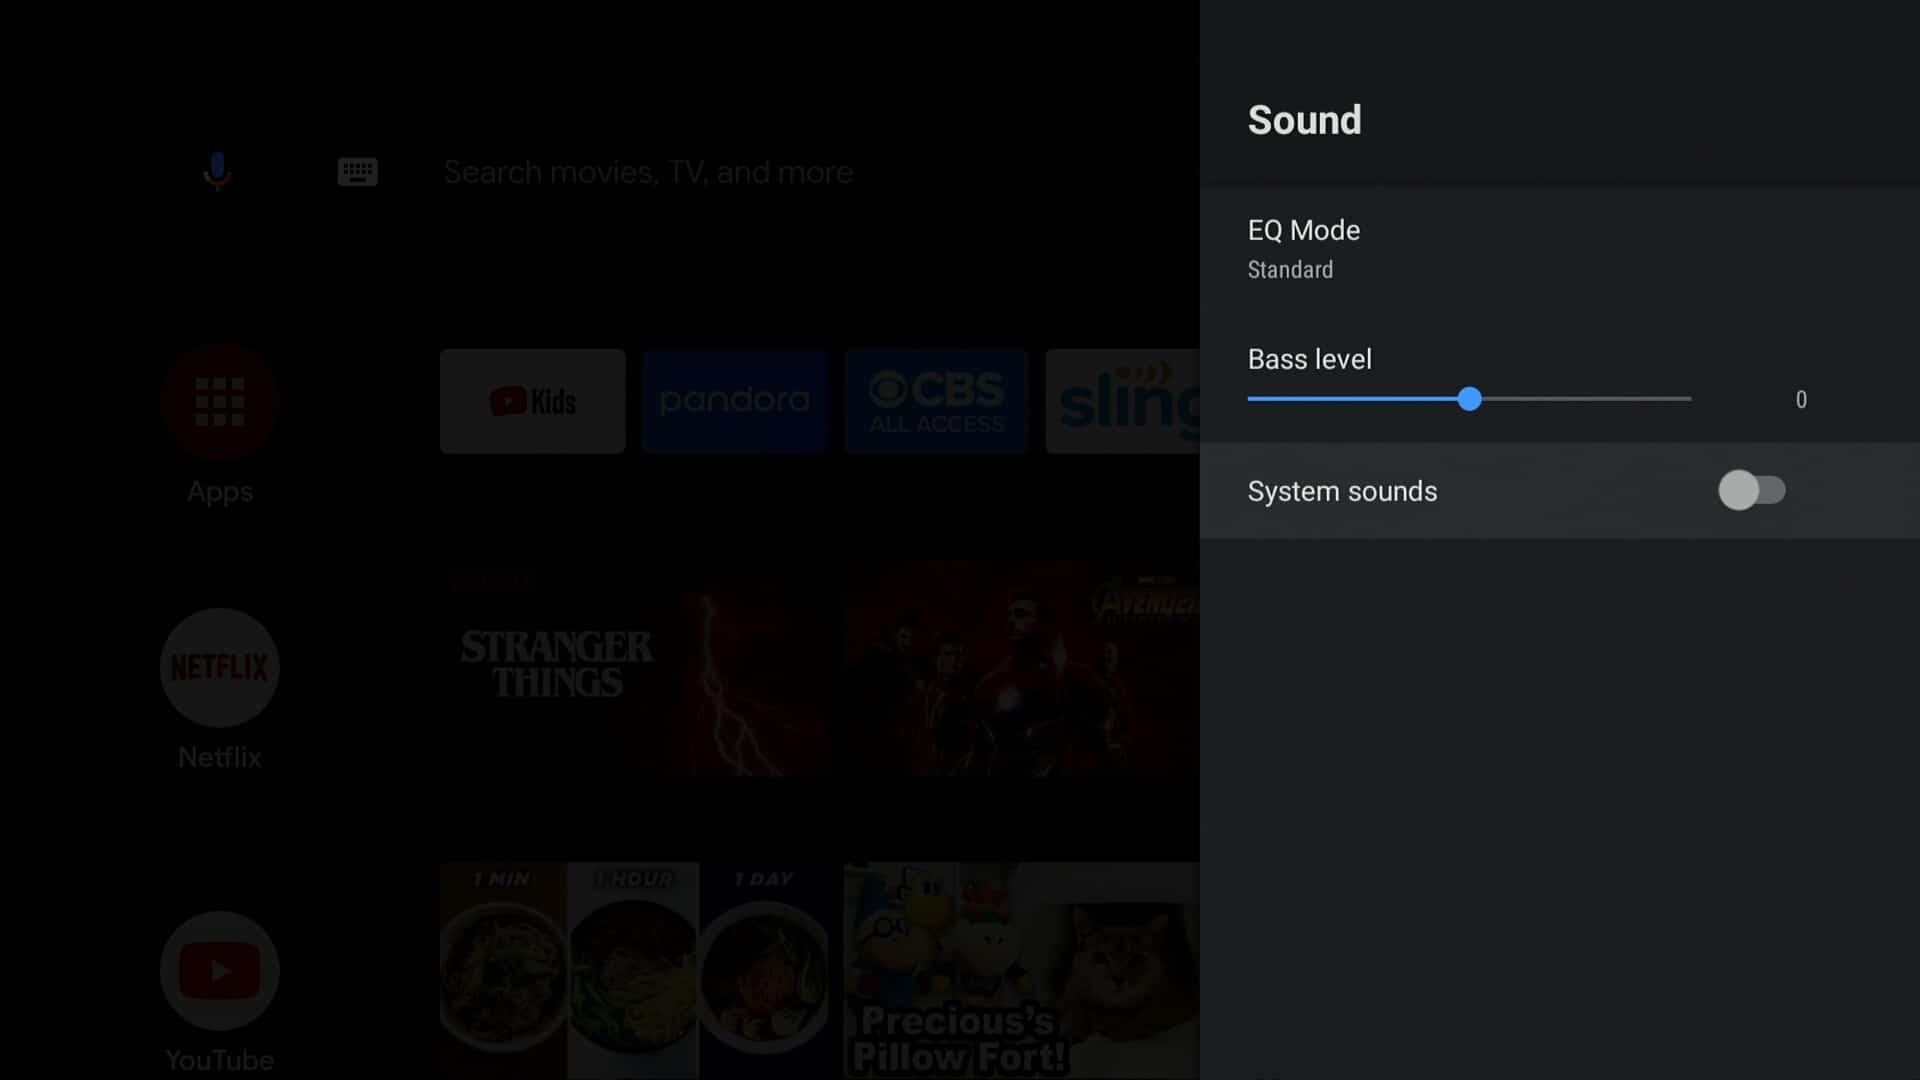 Android TV sound tweaks